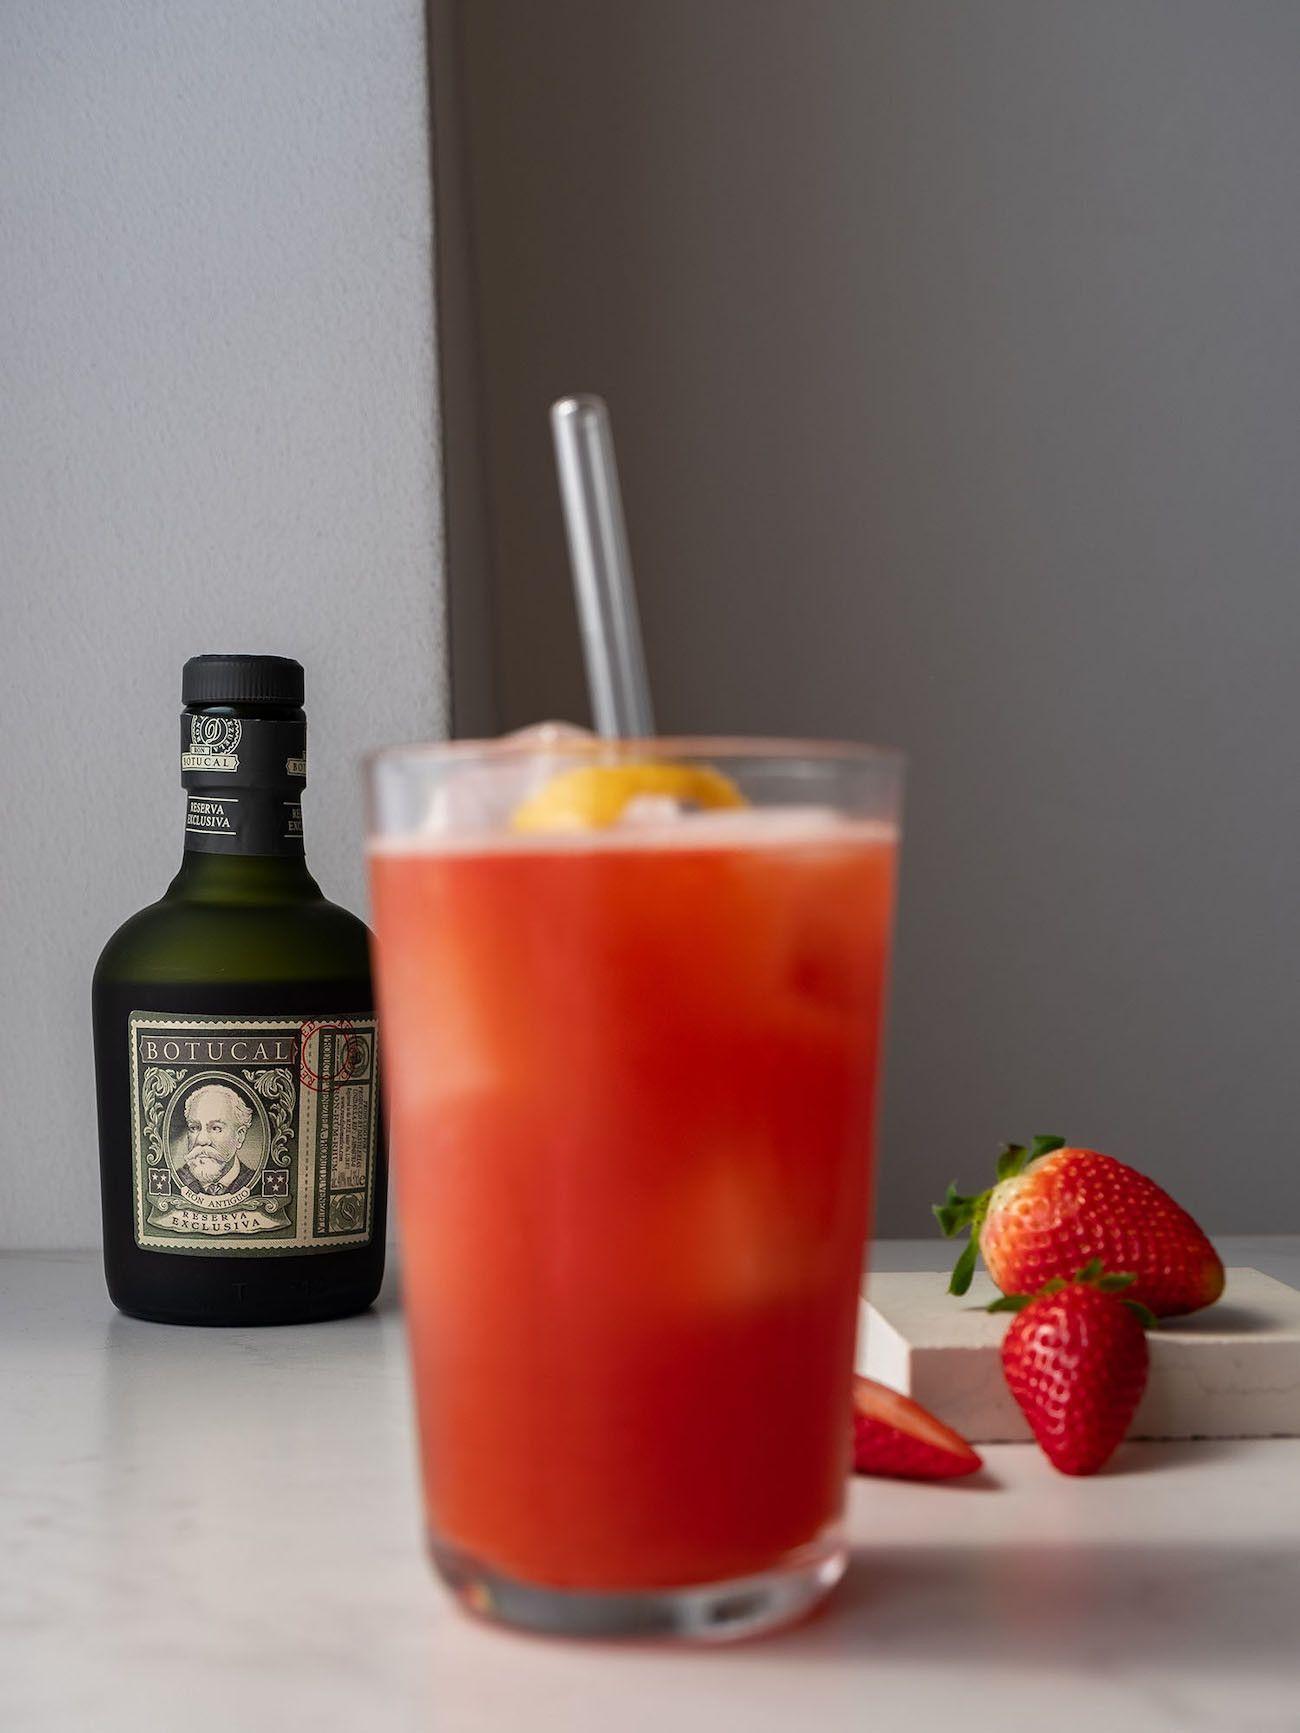 Foodblog, About Fuel, Rezept, Erdbeer-Rhabarber-Cooler, Rum, Botucal